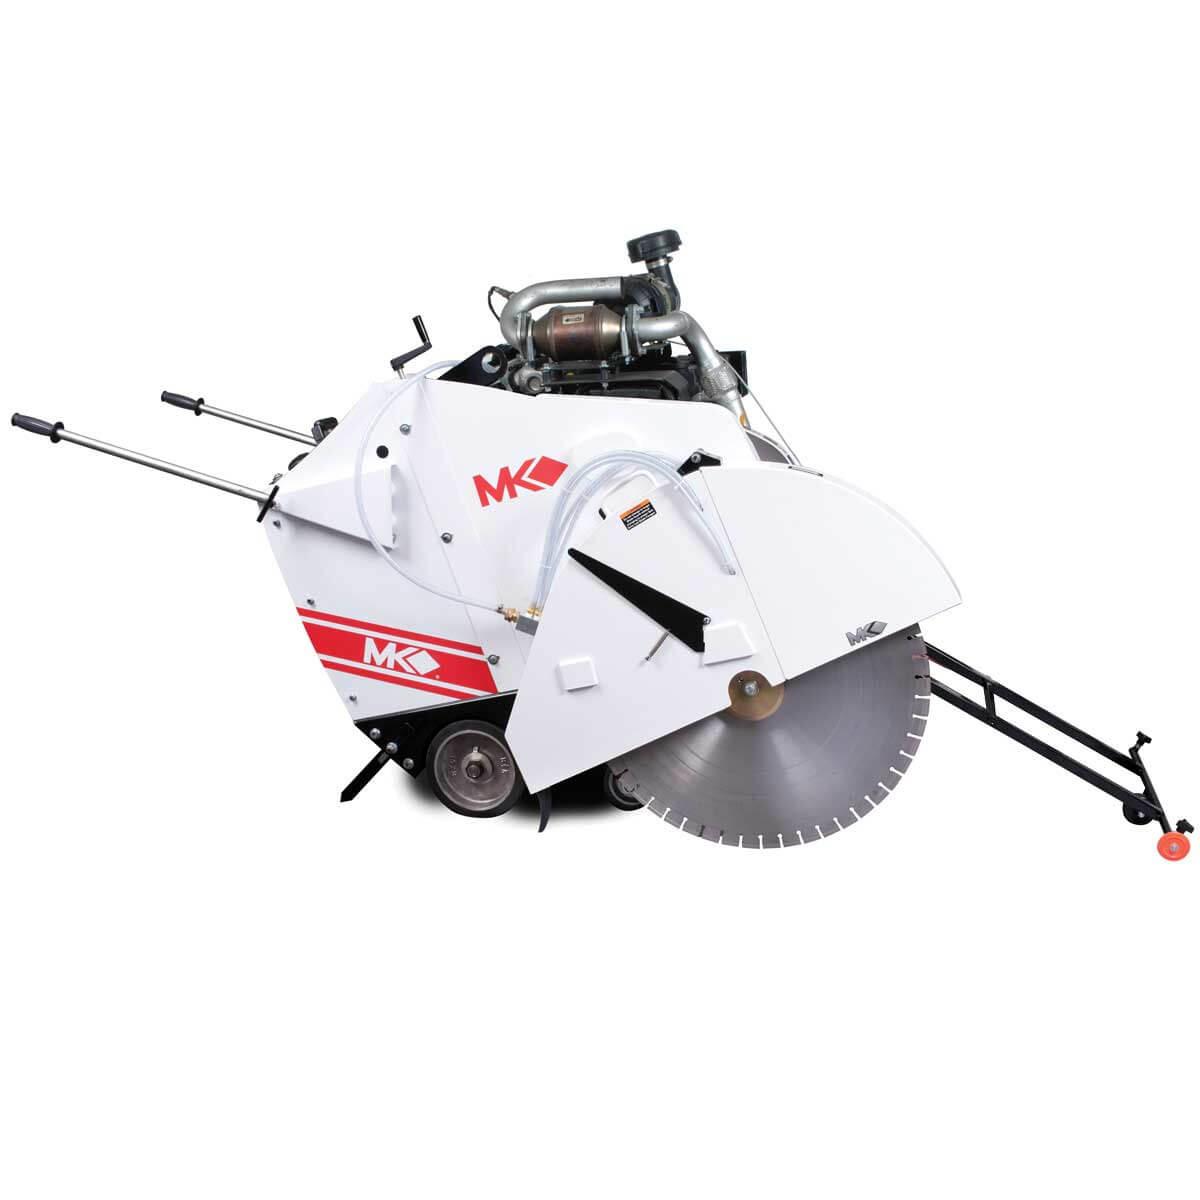 MK-4000 Self-Propelled Concrete Saw